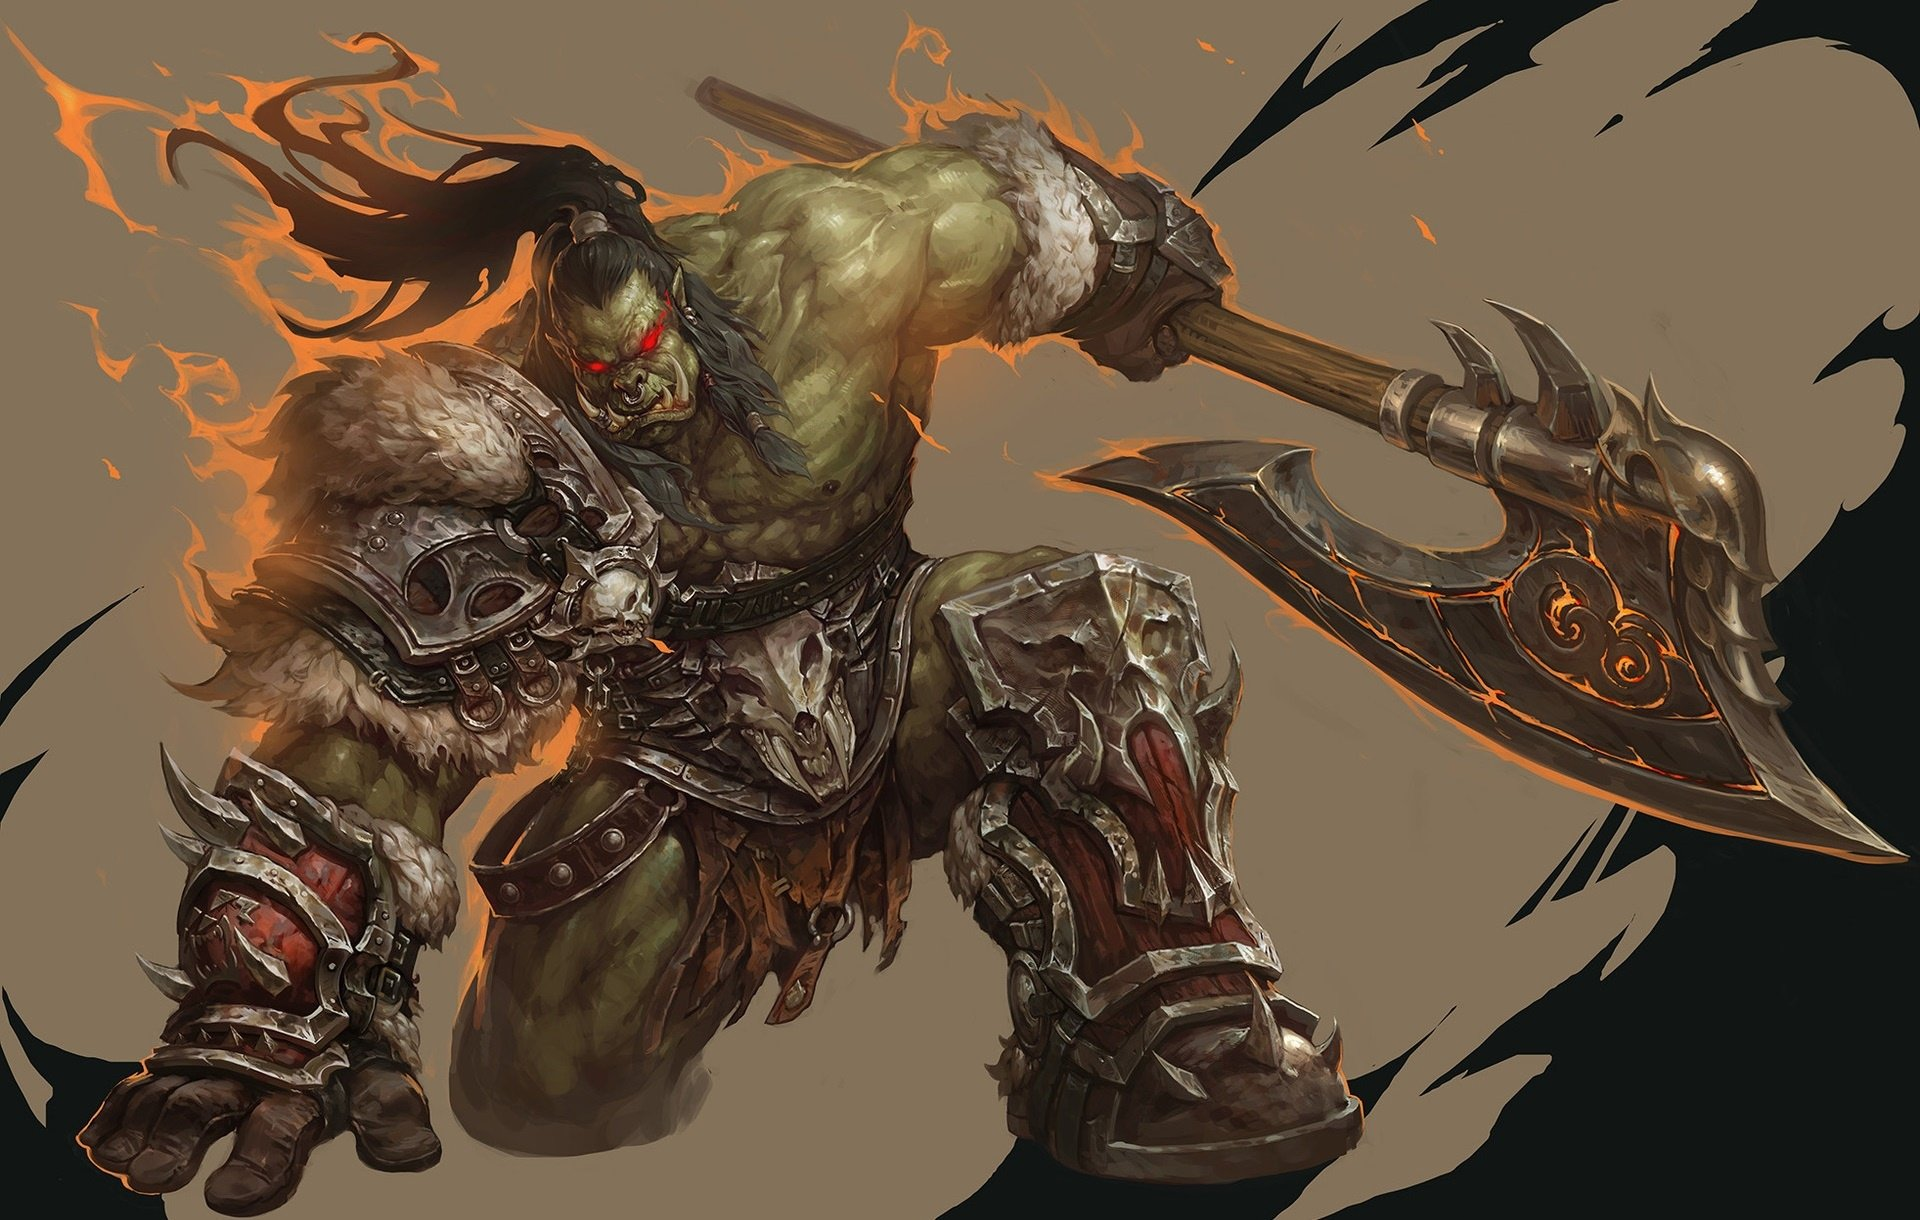 World Of Warcraft Hd Wallpaper Background Image 1920x1220 Id